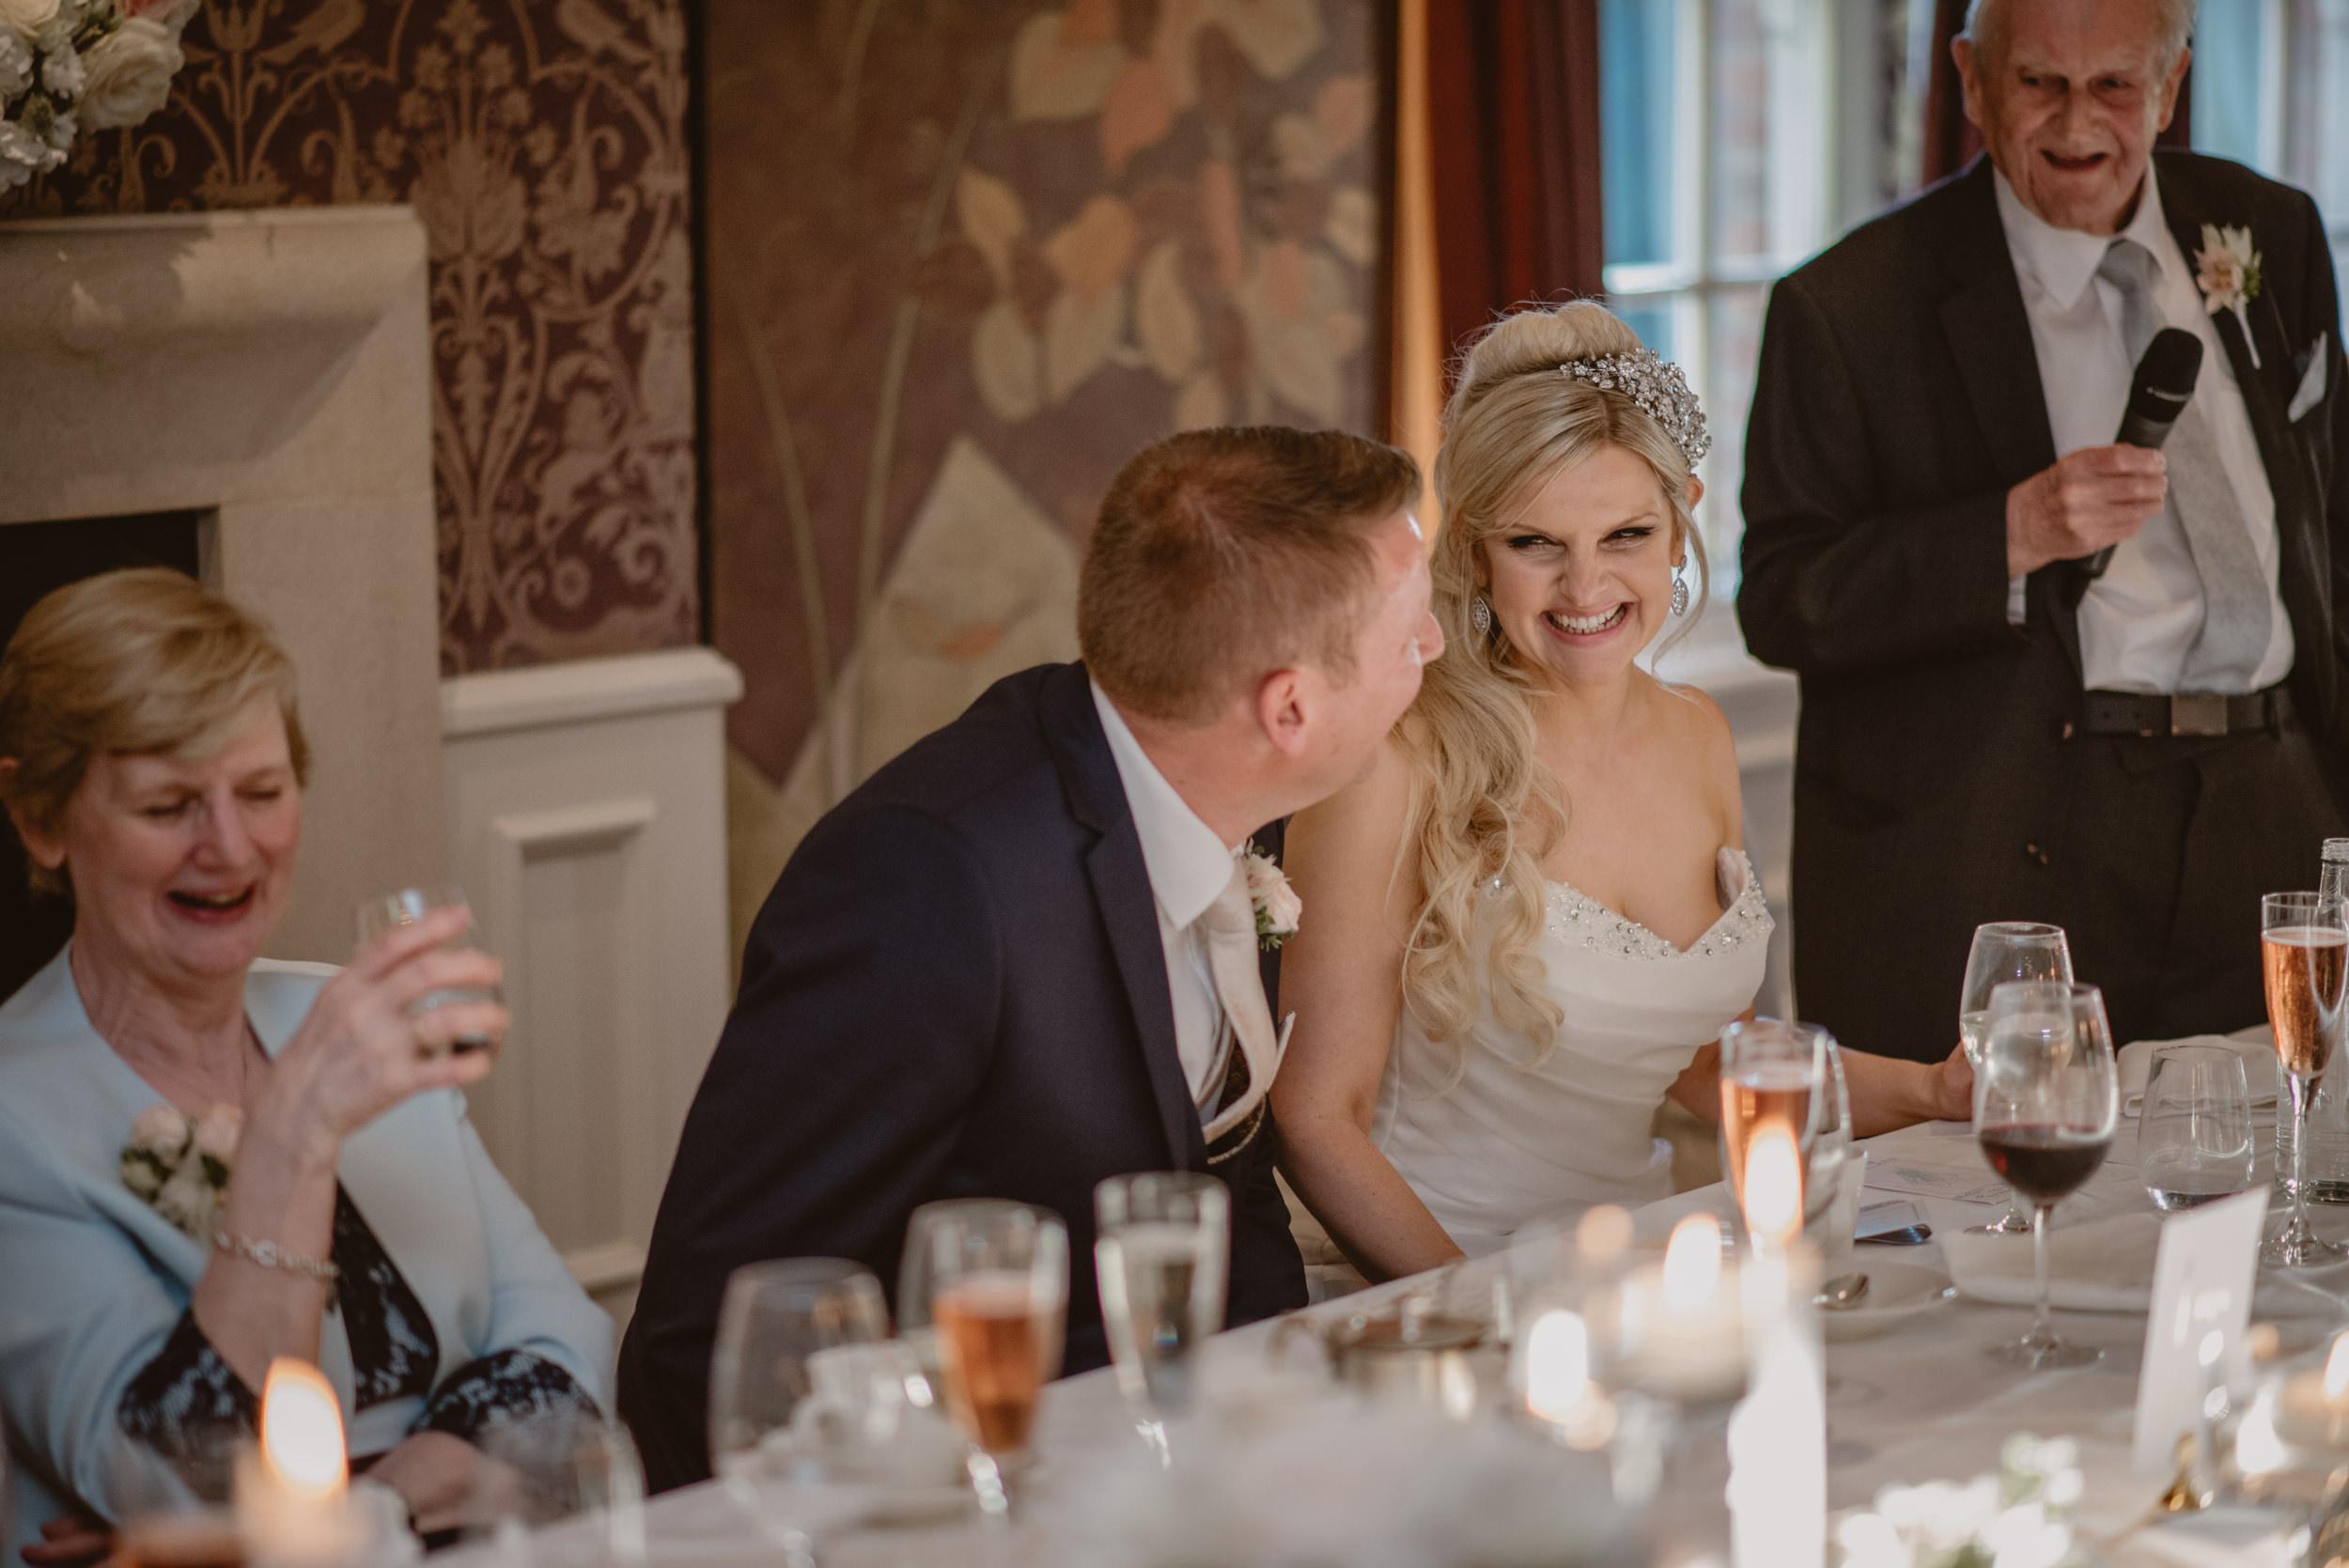 Trisha-and-Roger-wedding-The-Priory-Church-and-Chewton-Glen-Hotel-Christchurch-Manu-Mendoza-Wedding-Photography-399.jpg